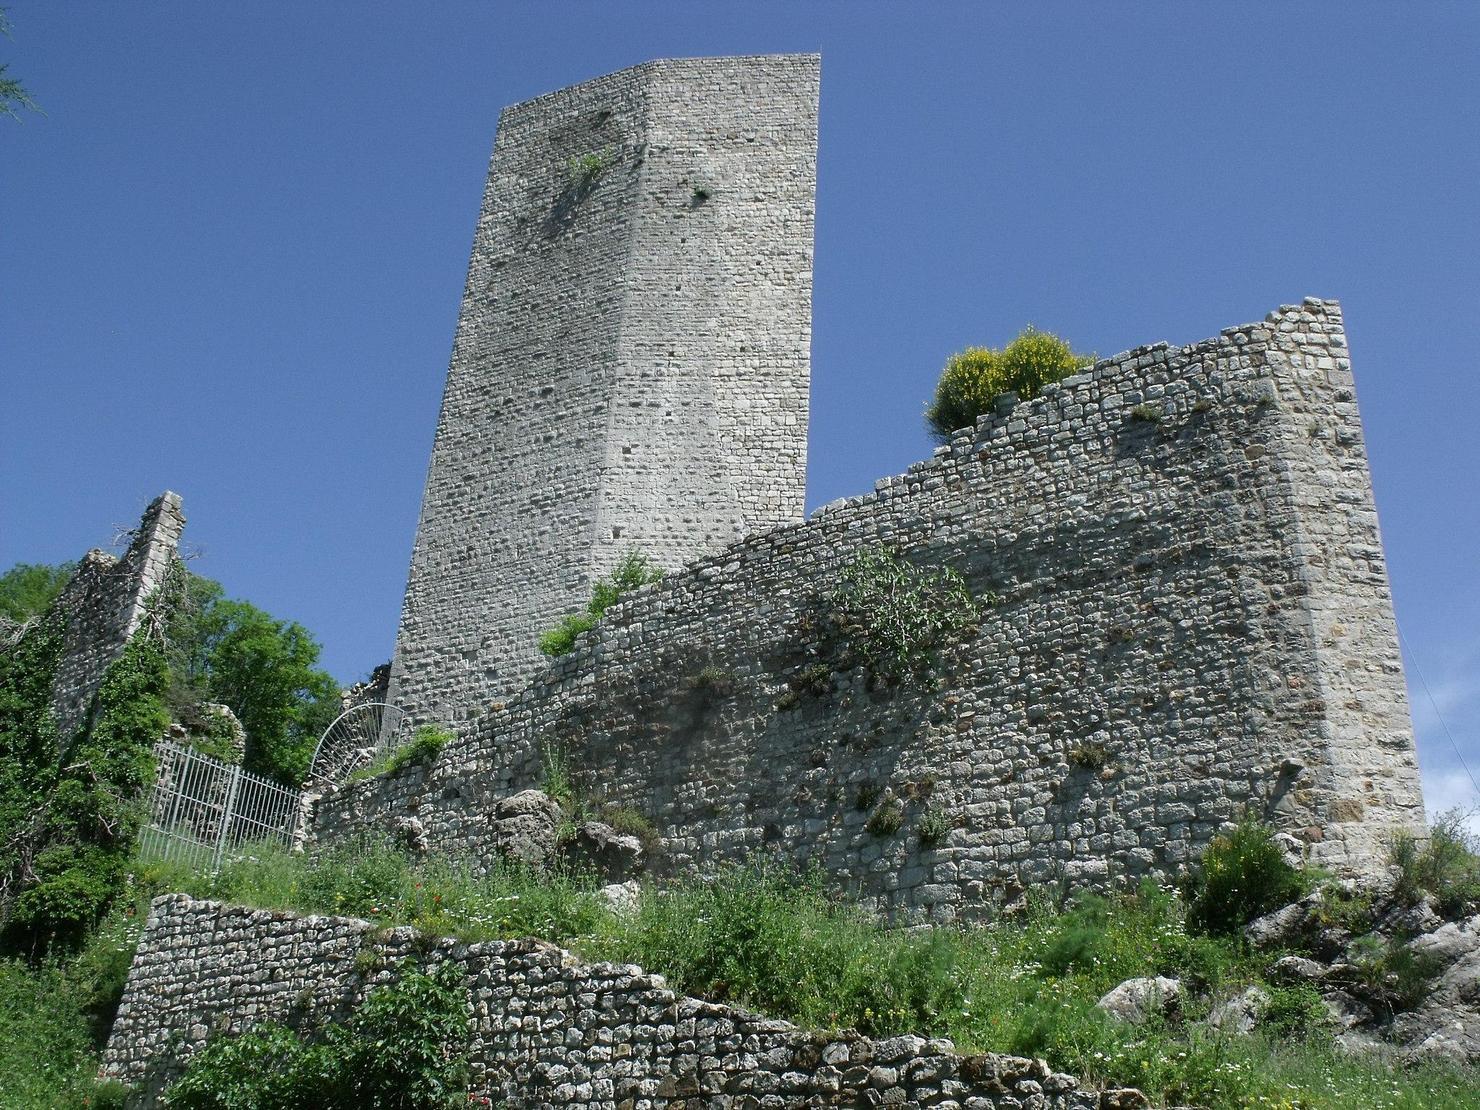 visit-castellazzara-rocca-silvana-castellazzara